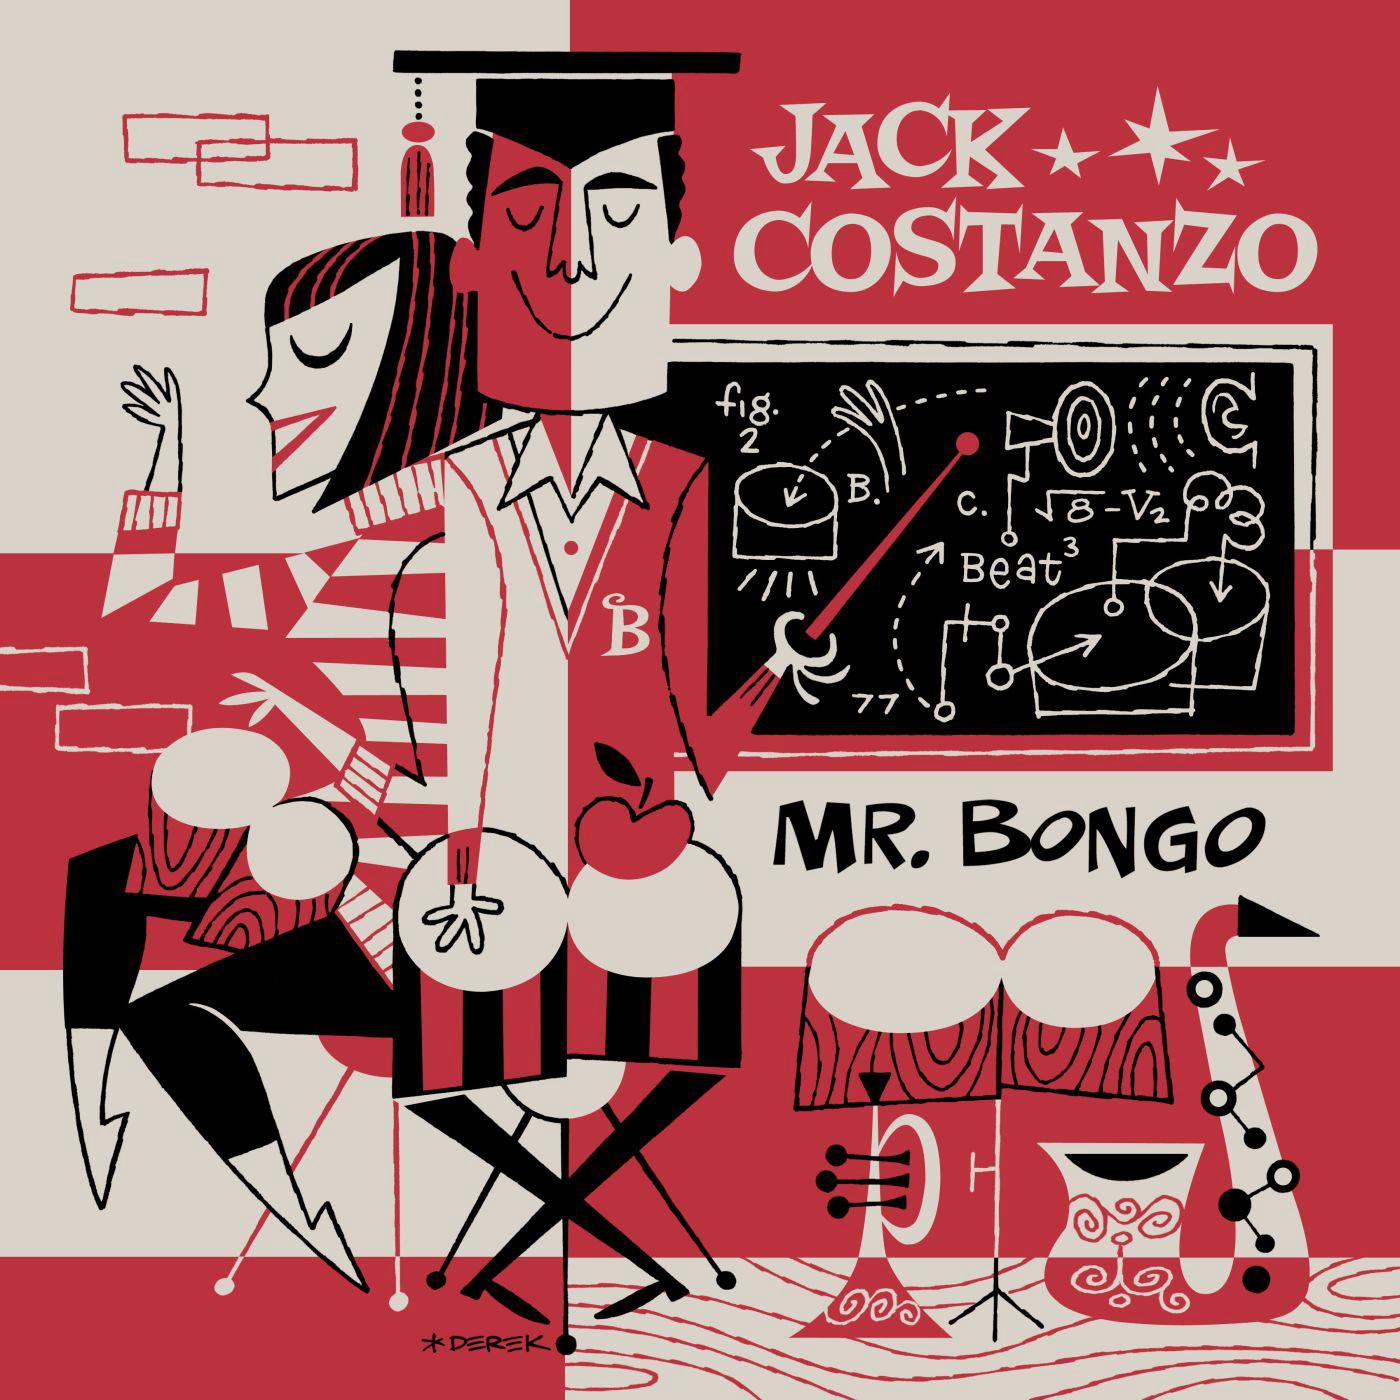 Jack Costanzo Net Worth